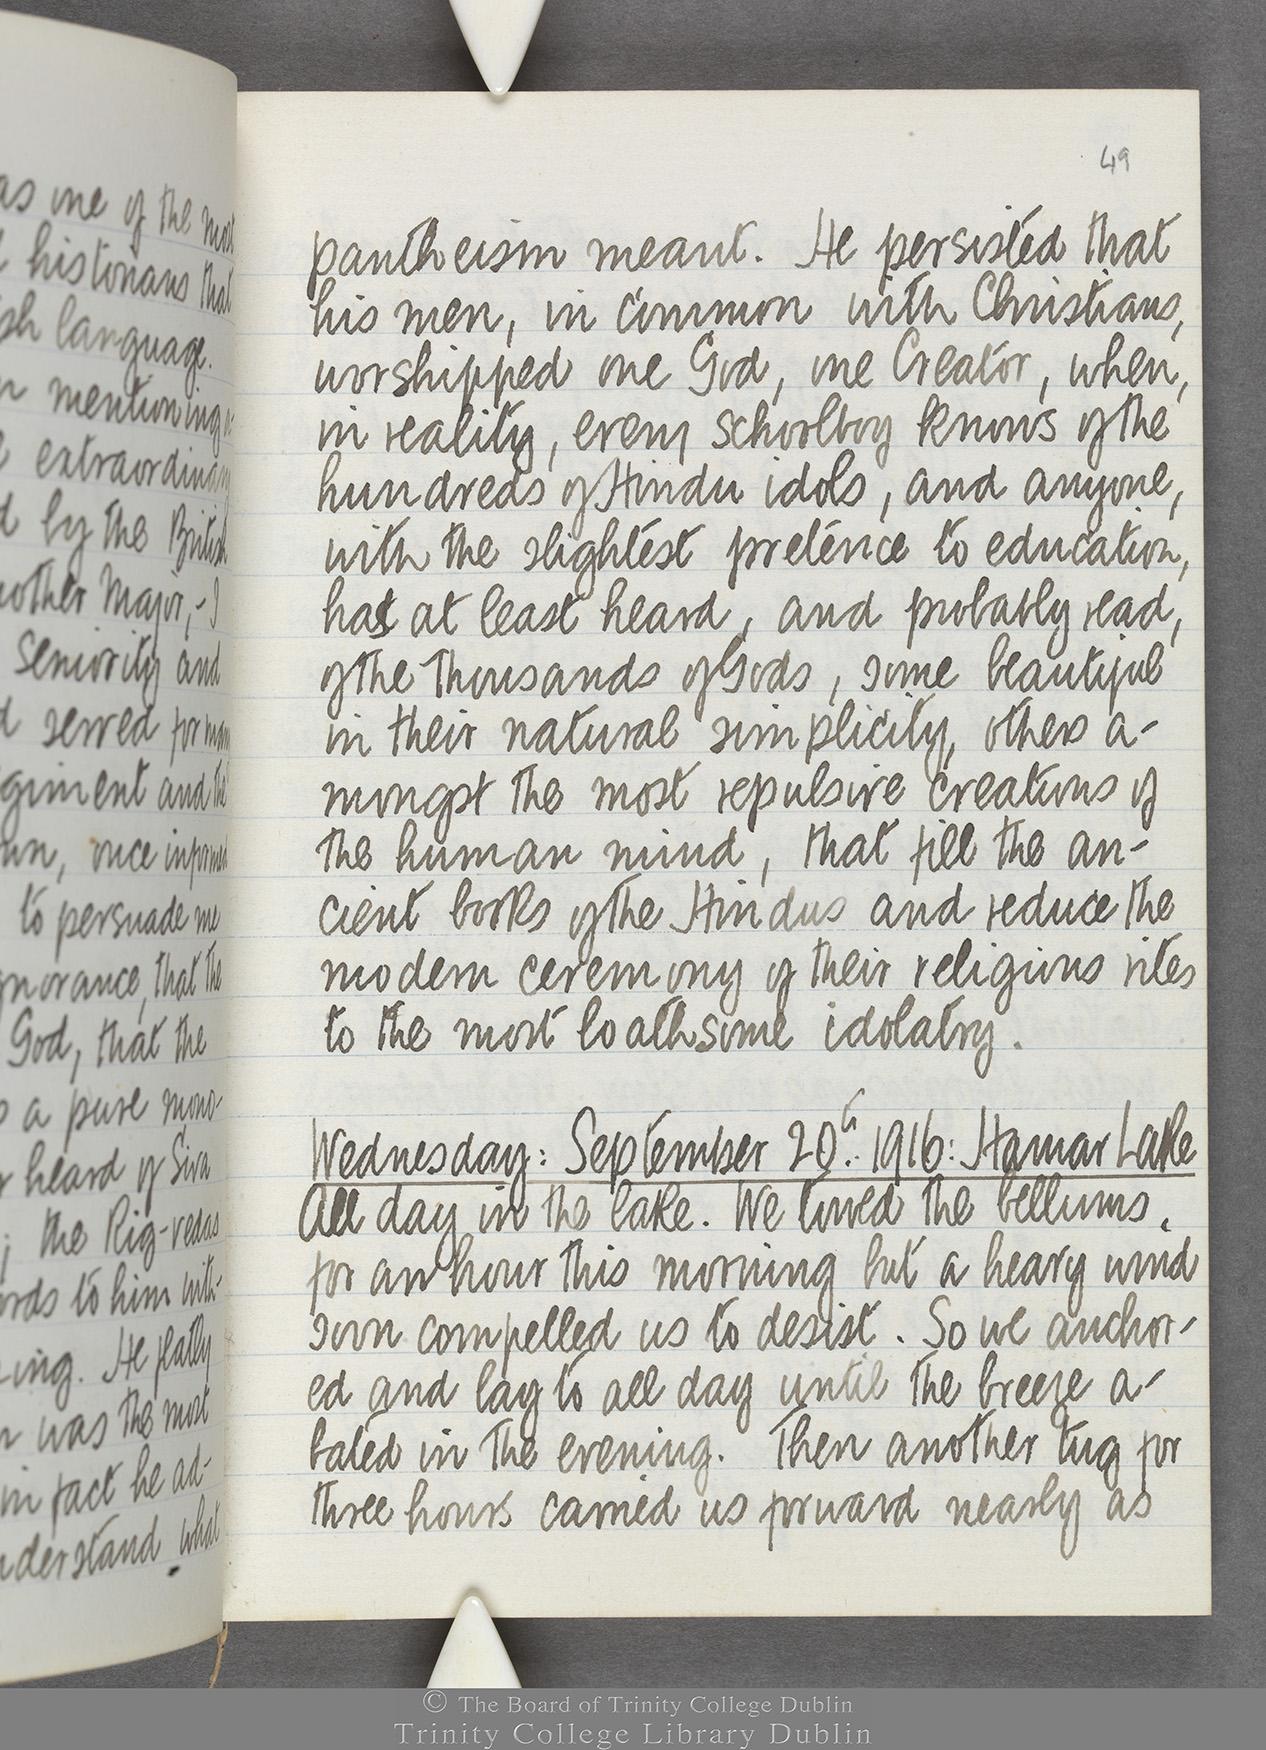 TCD MS 10516 folio 49 recto